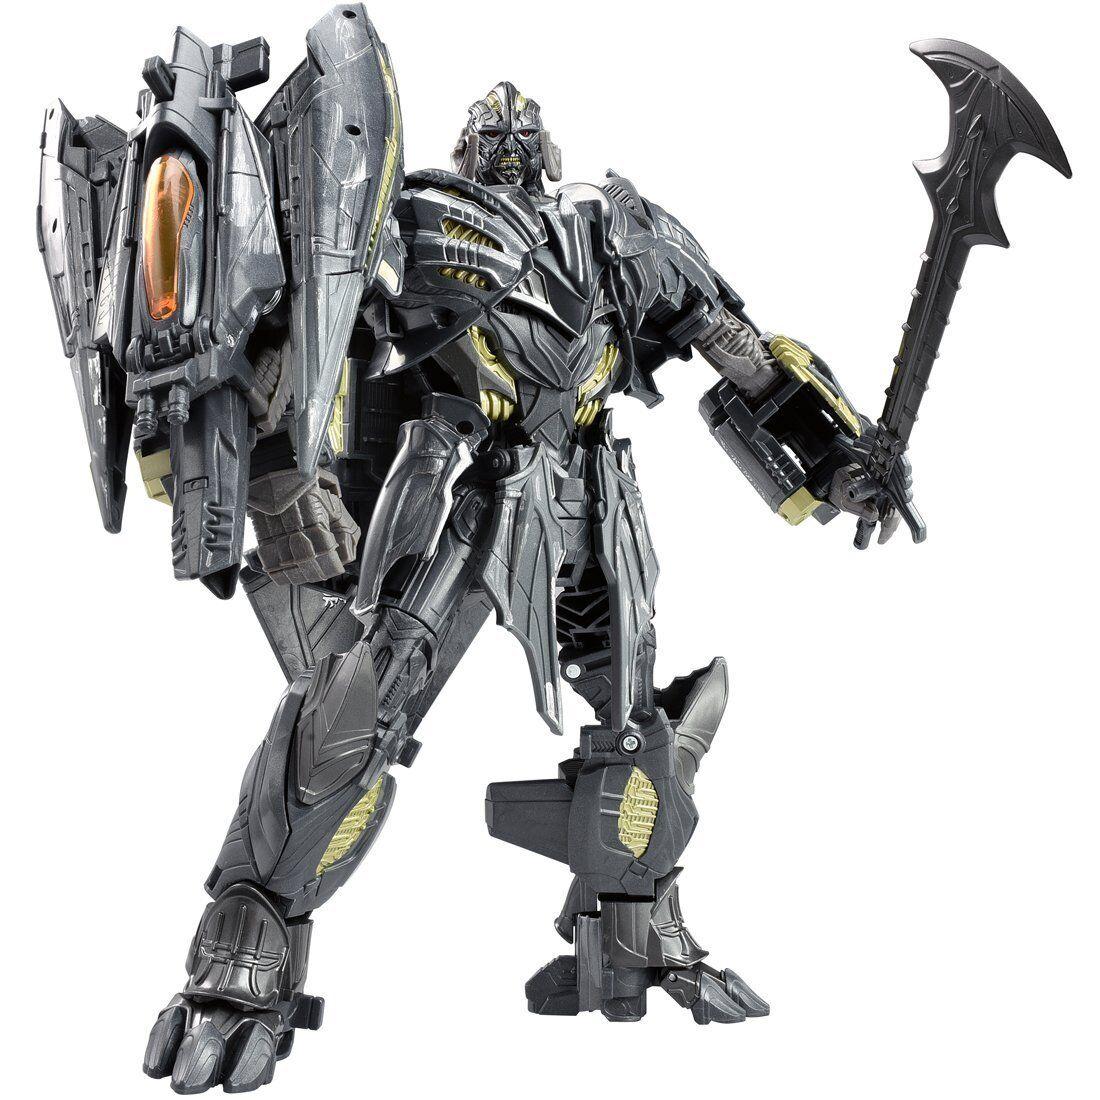 TLK-19 Megatron Japan version -Transformers The Last Knight- PSL NEW